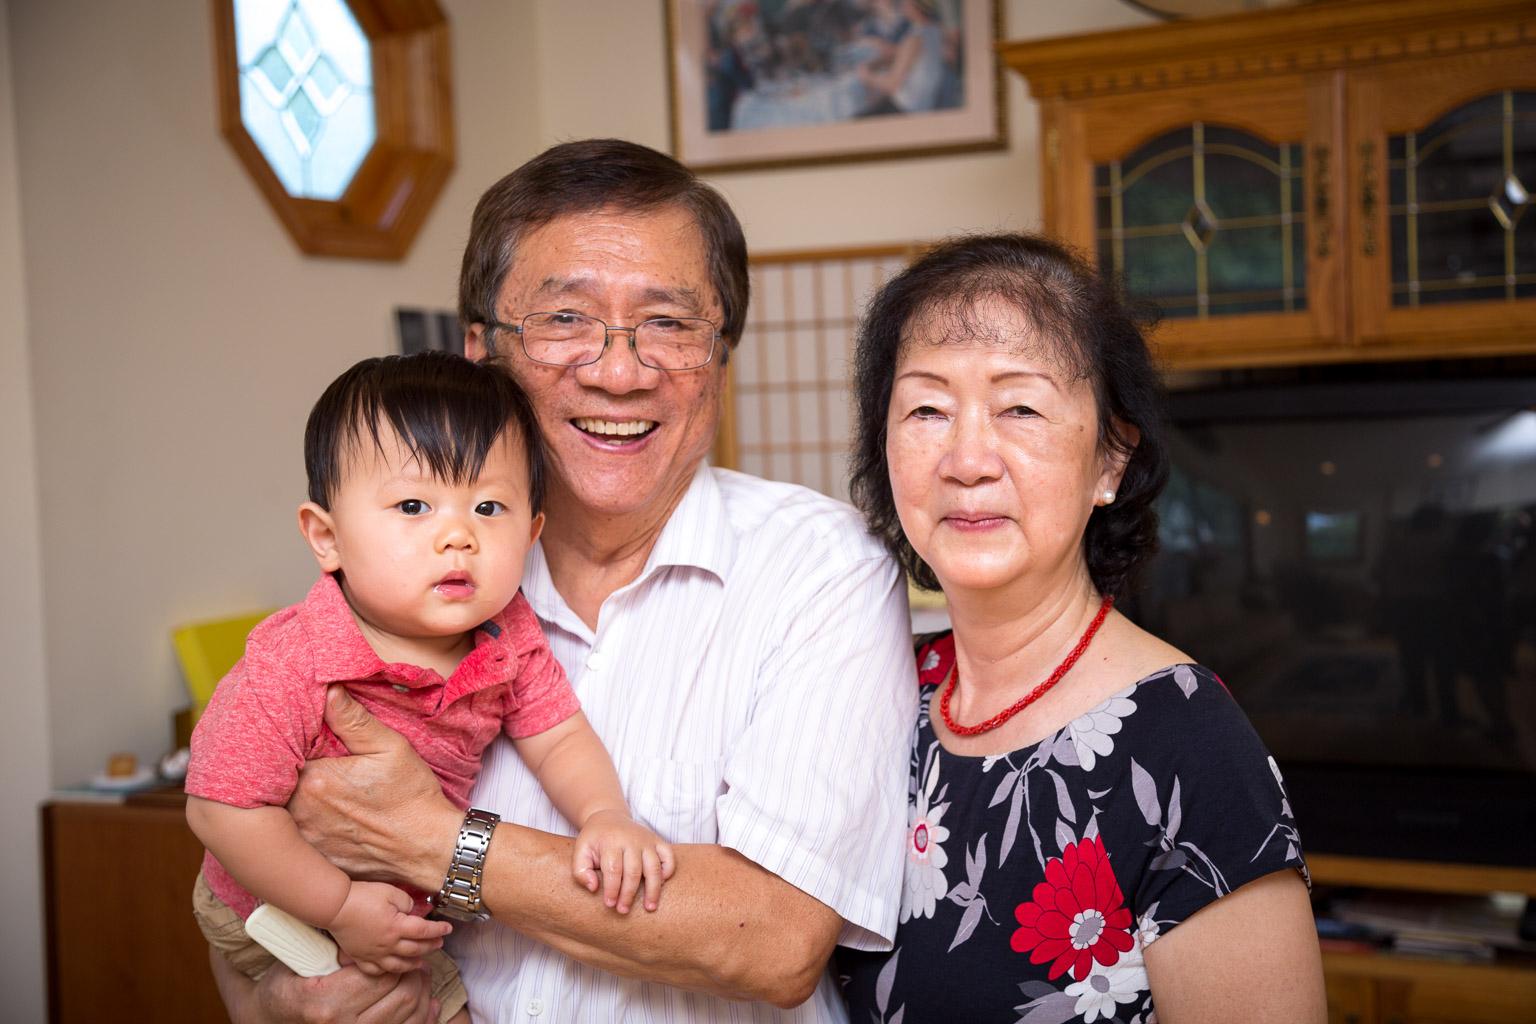 The proud grandparents.